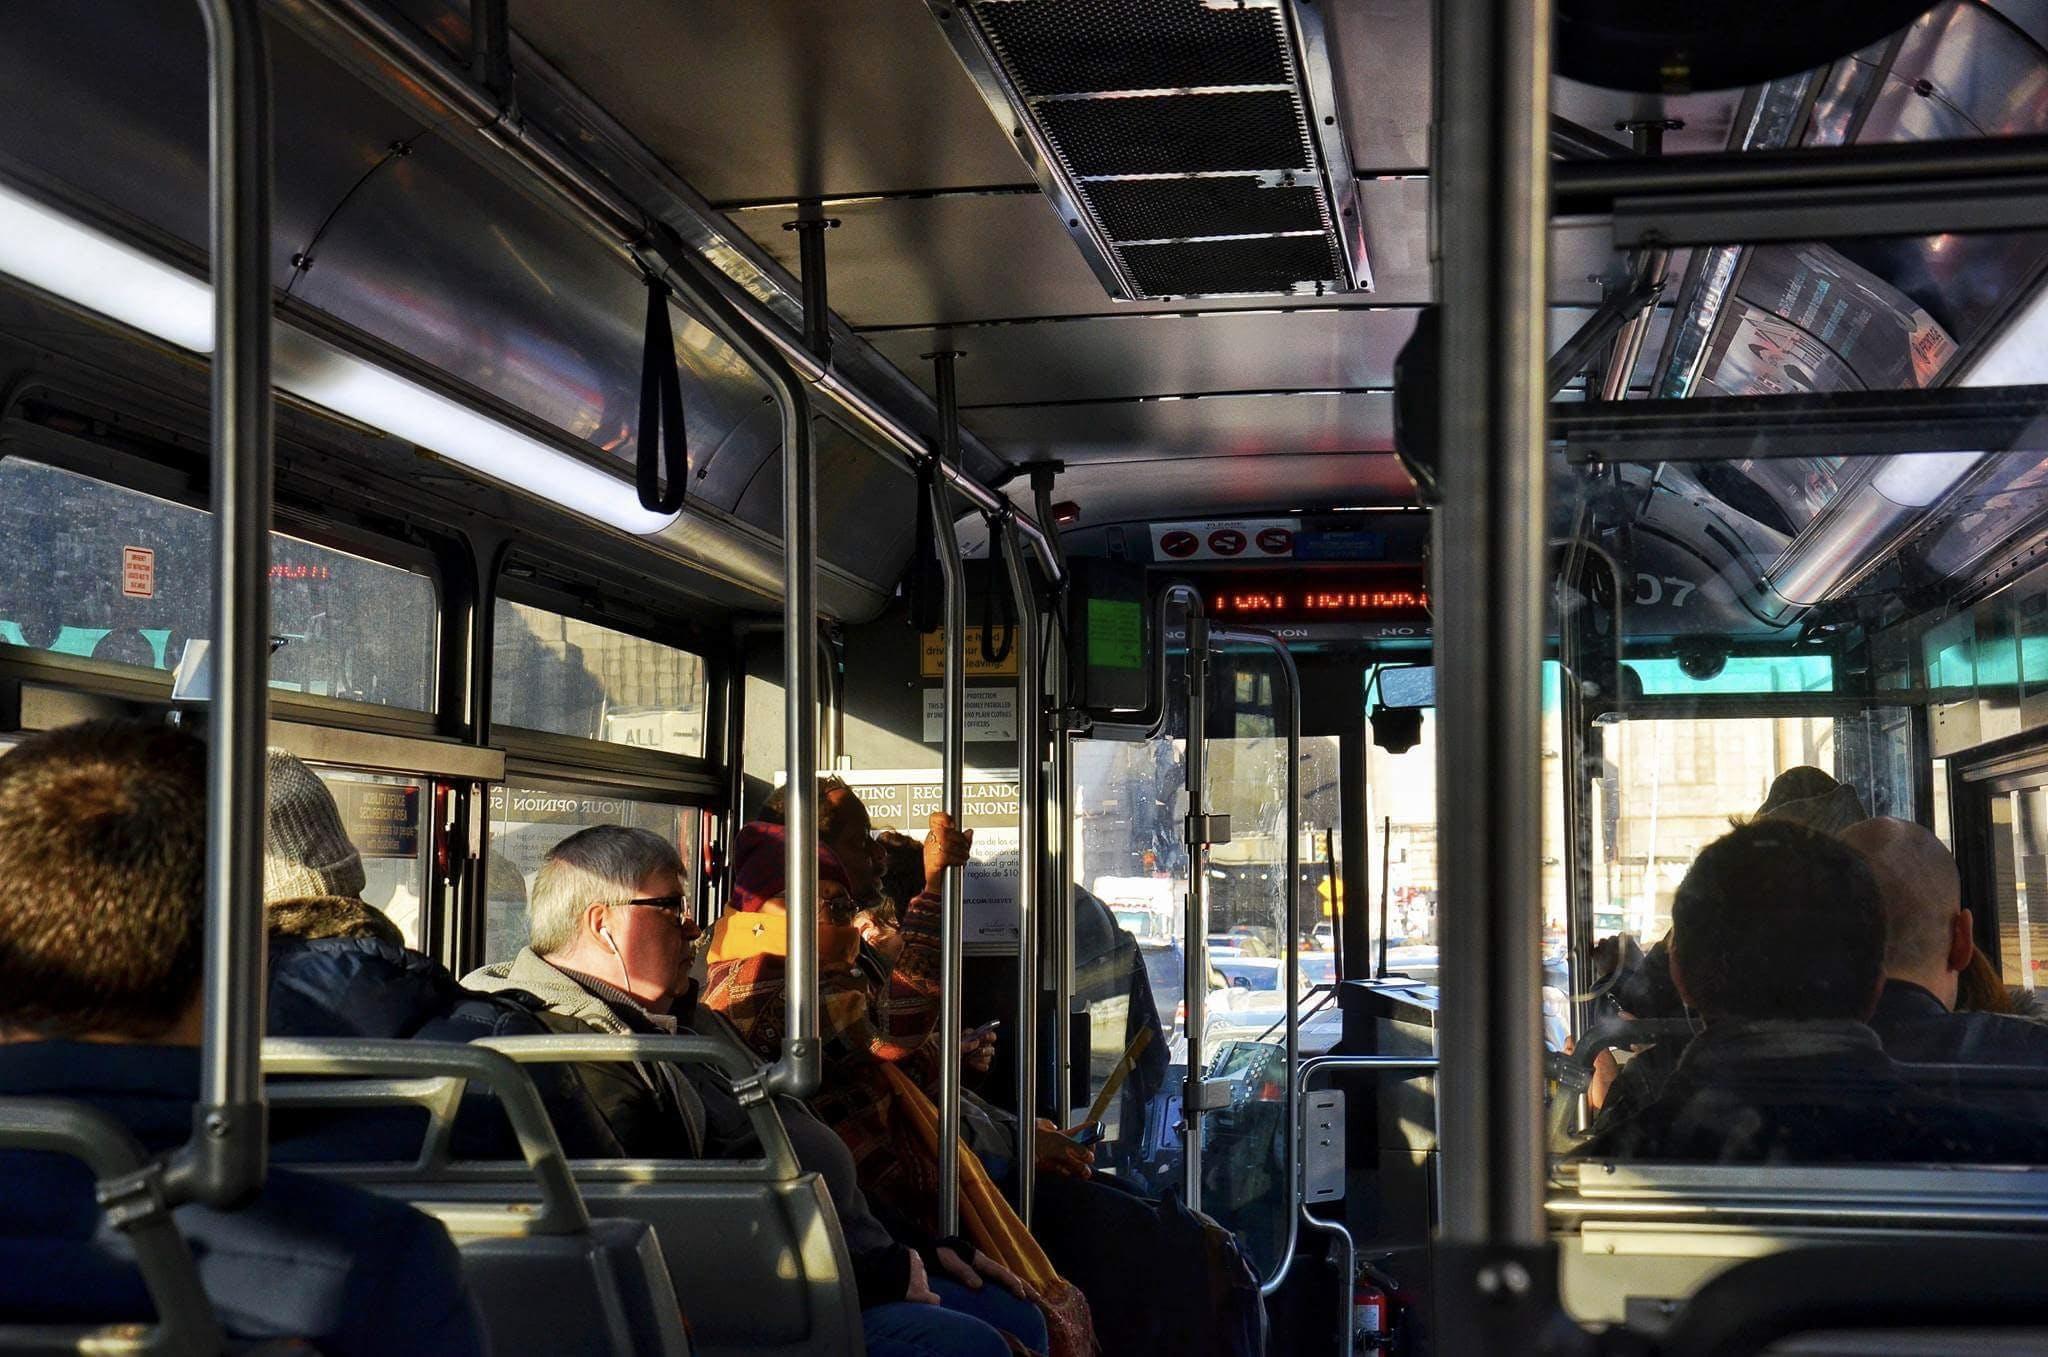 Free stock photo of people, sunlight, public transport, new york city